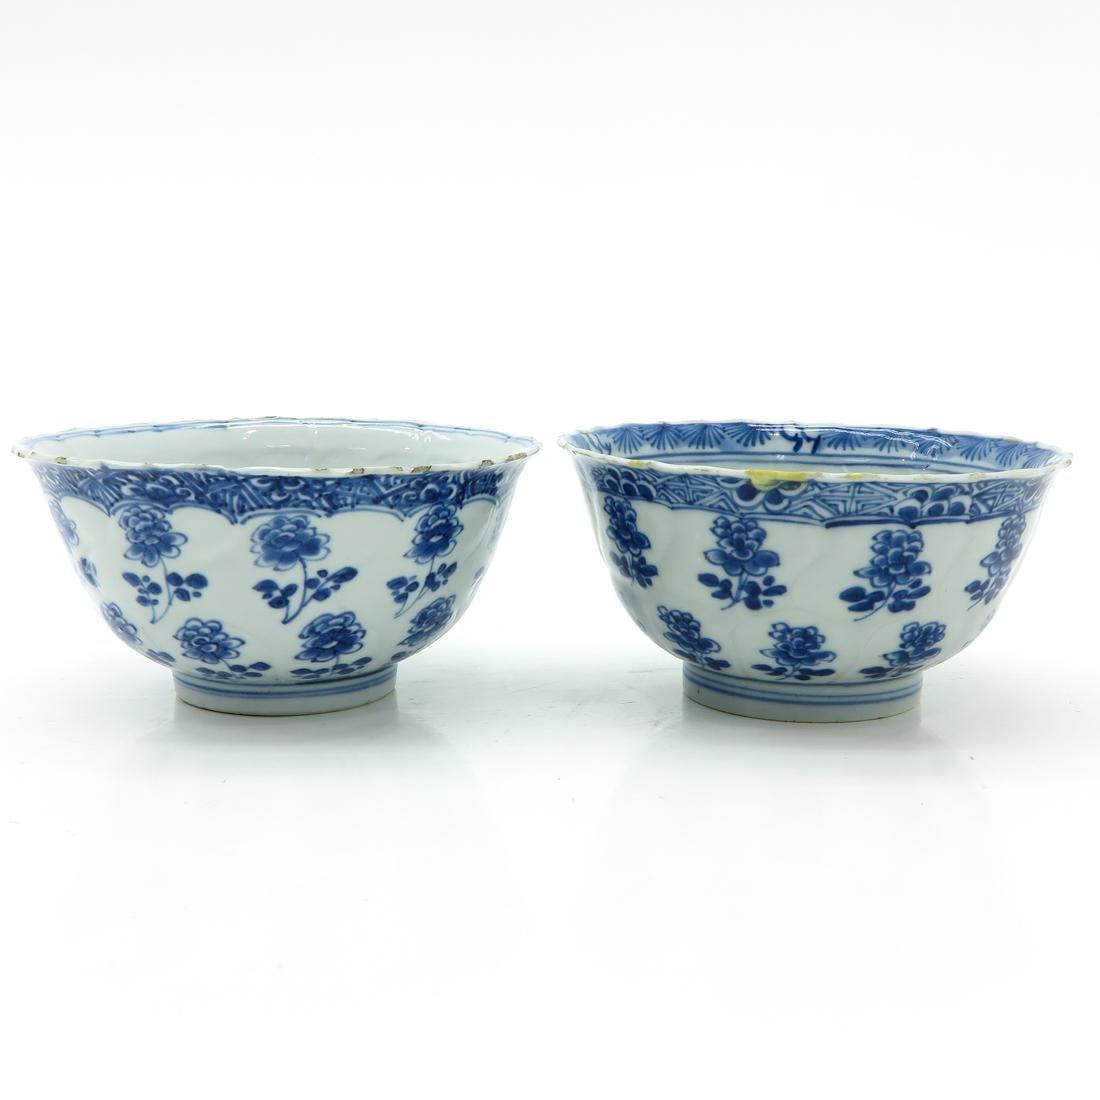 Lot of 2 Bowls